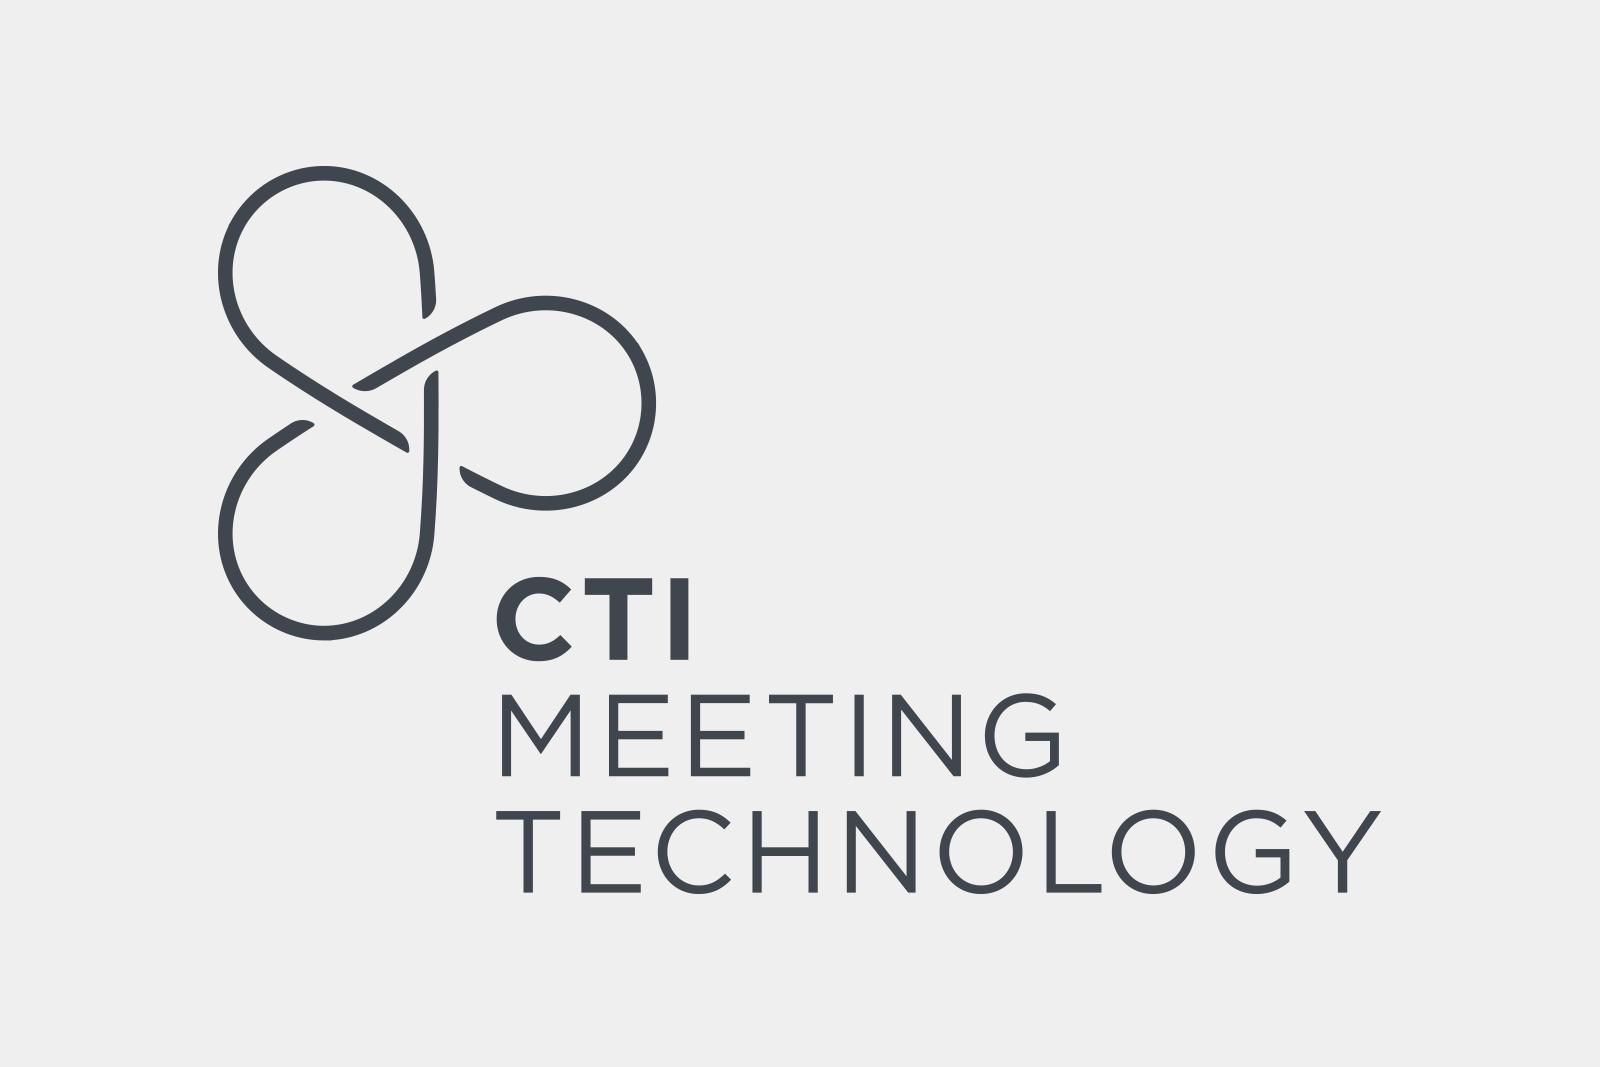 Cti Logo 2